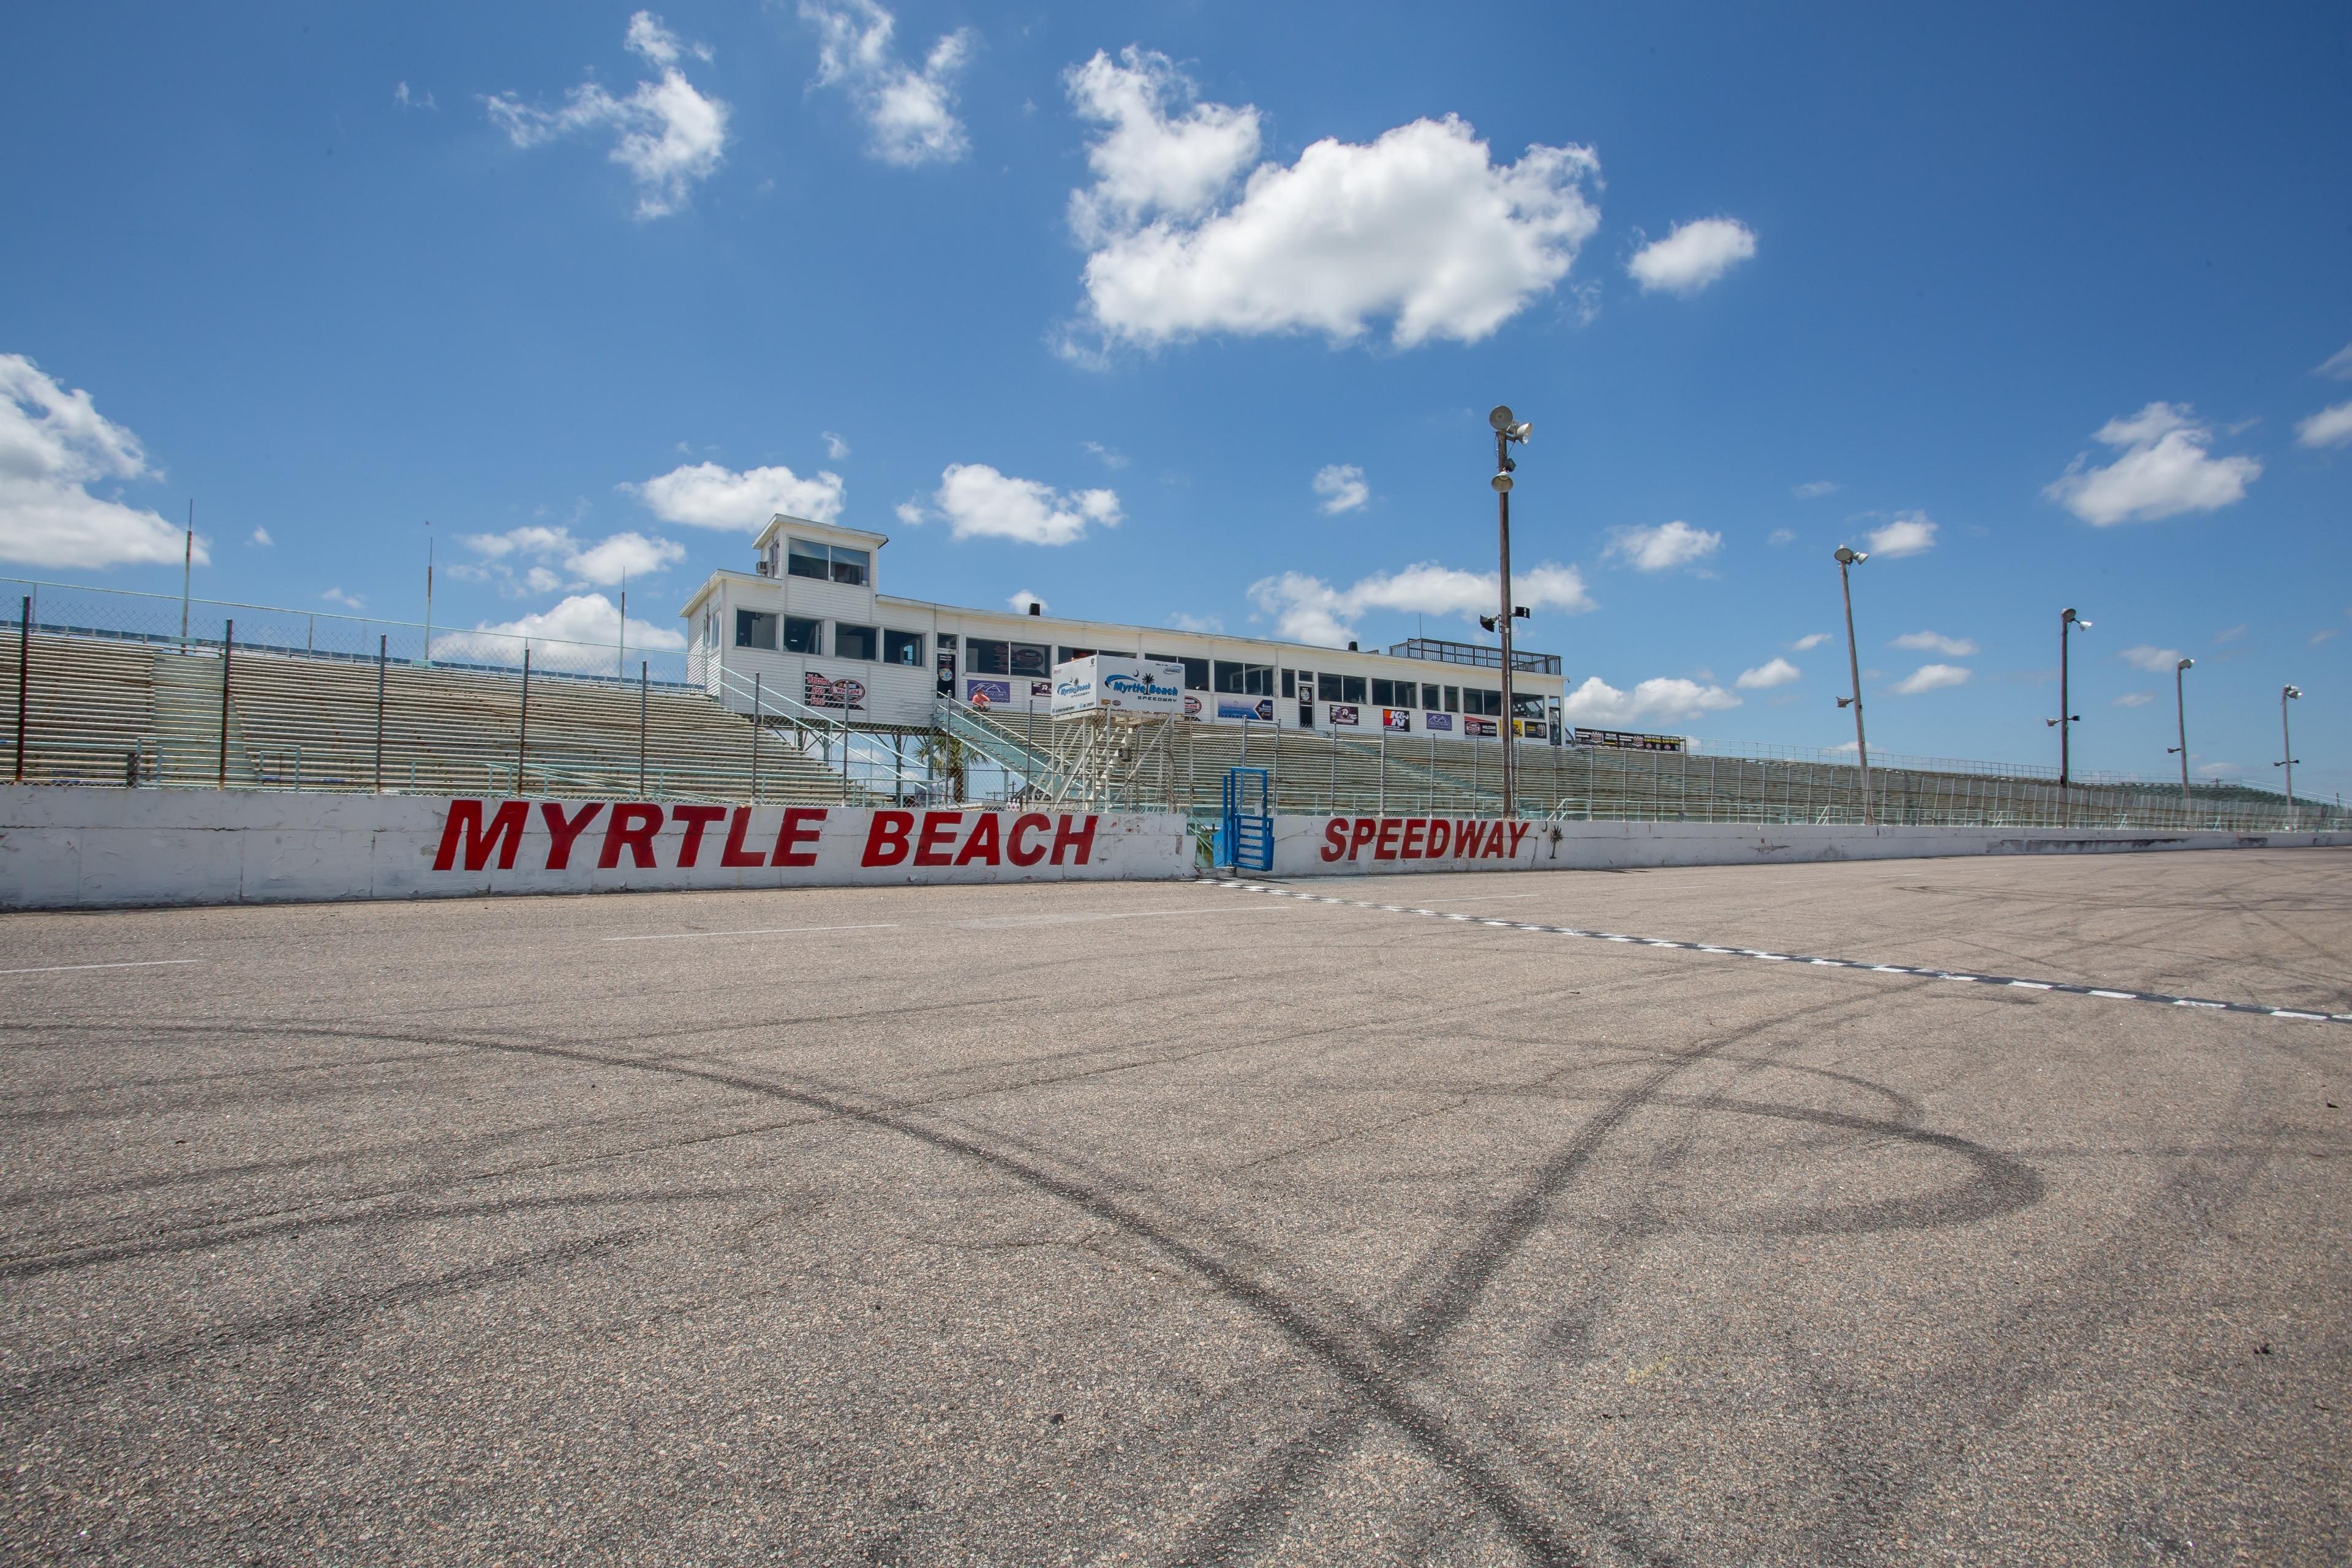 Myrtle Beach Speedway, Carolina Forest, South Carolina, United States of America